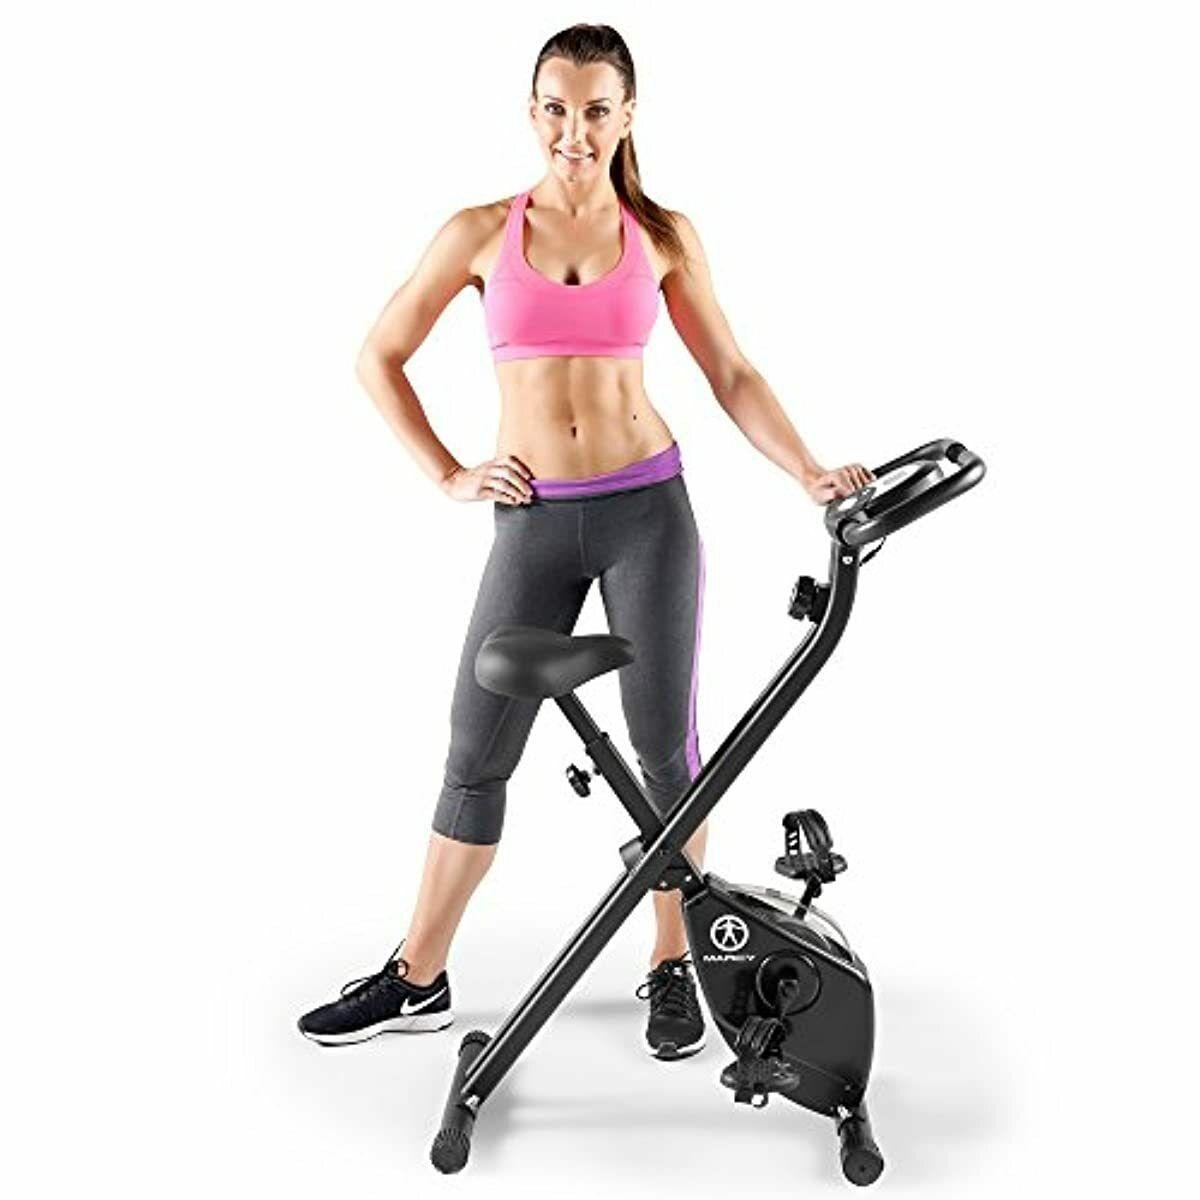 BLACK Marcy Folding Upright Exercise Spin Bike Magnetic Resi